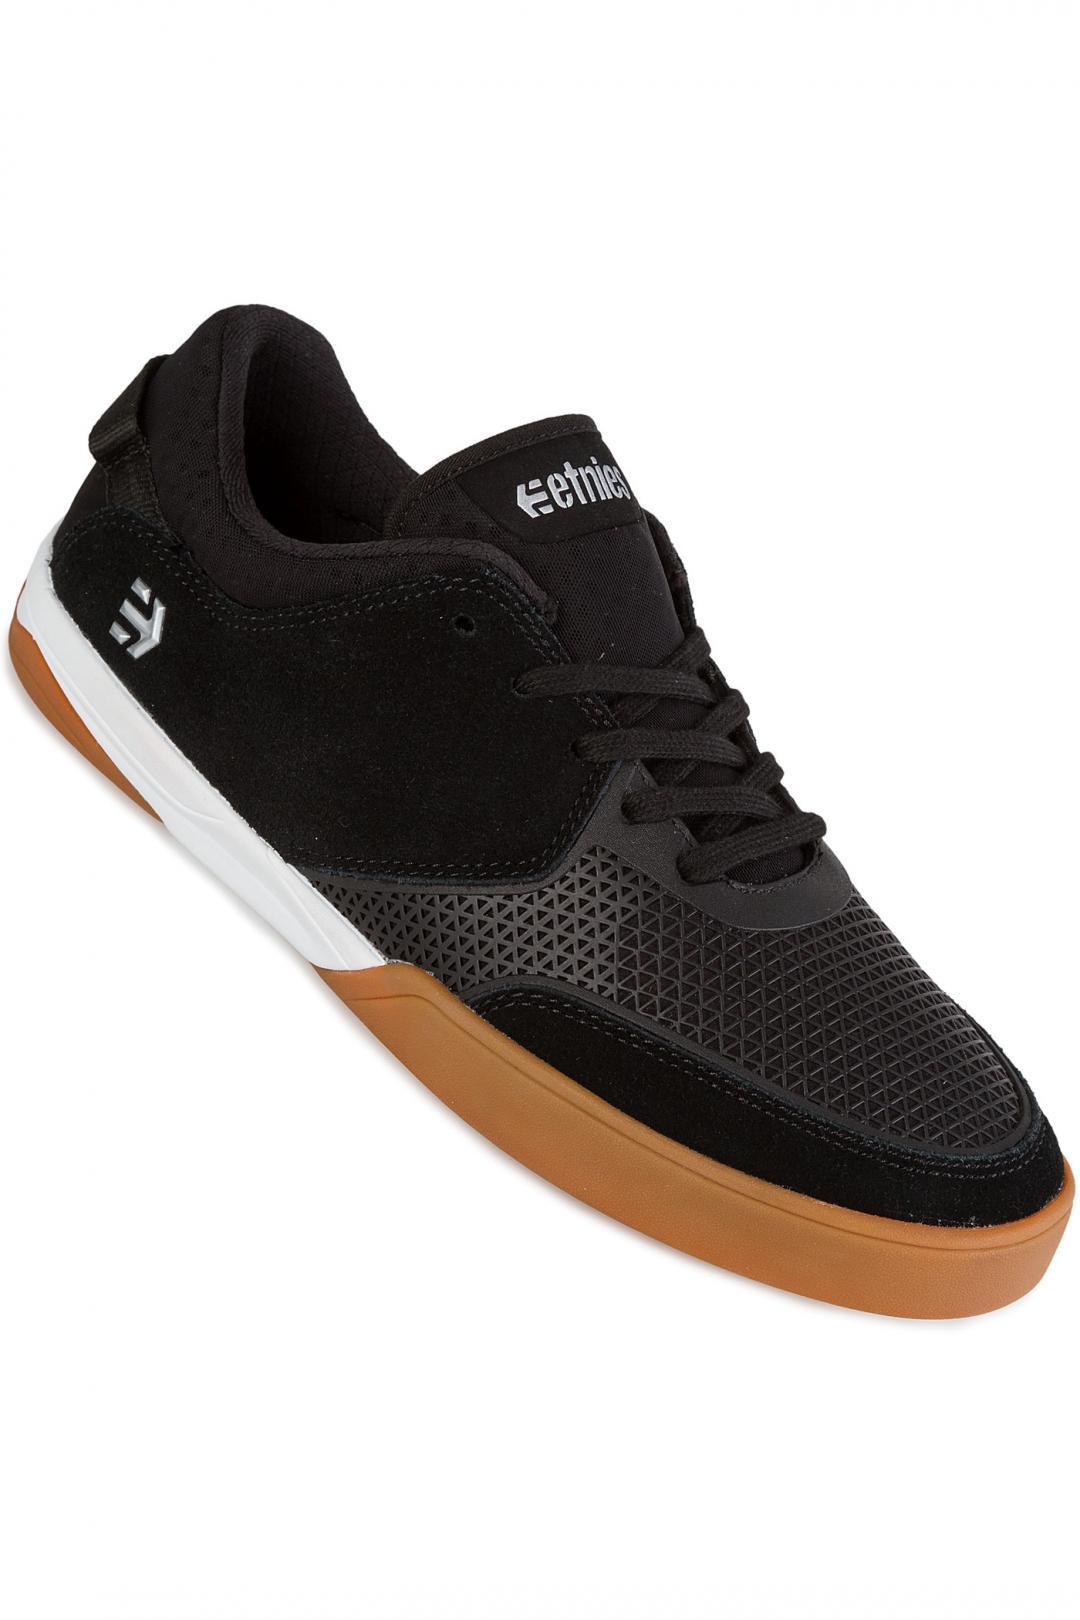 Uomo Etnies Helix black white gum   Scarpe da skate